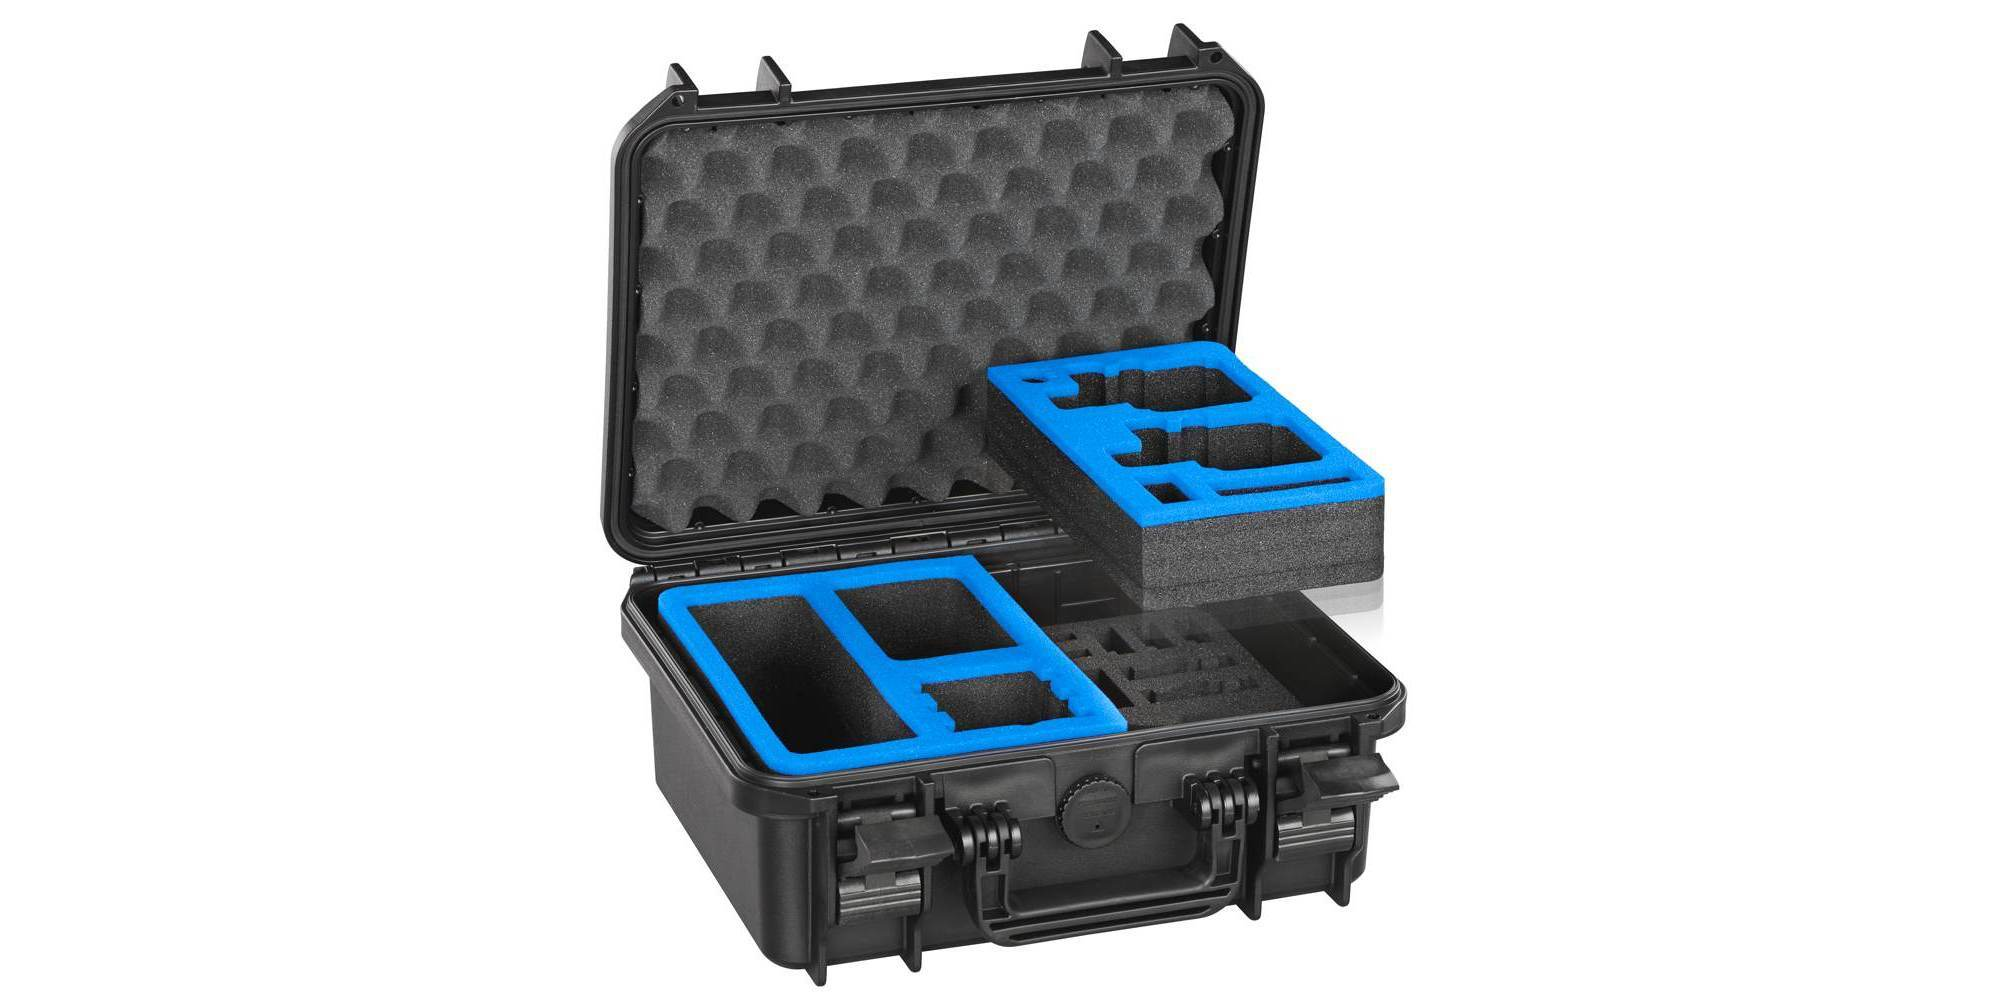 Кейс ударопрочный VG M0300 для экшн-камер раскрытый